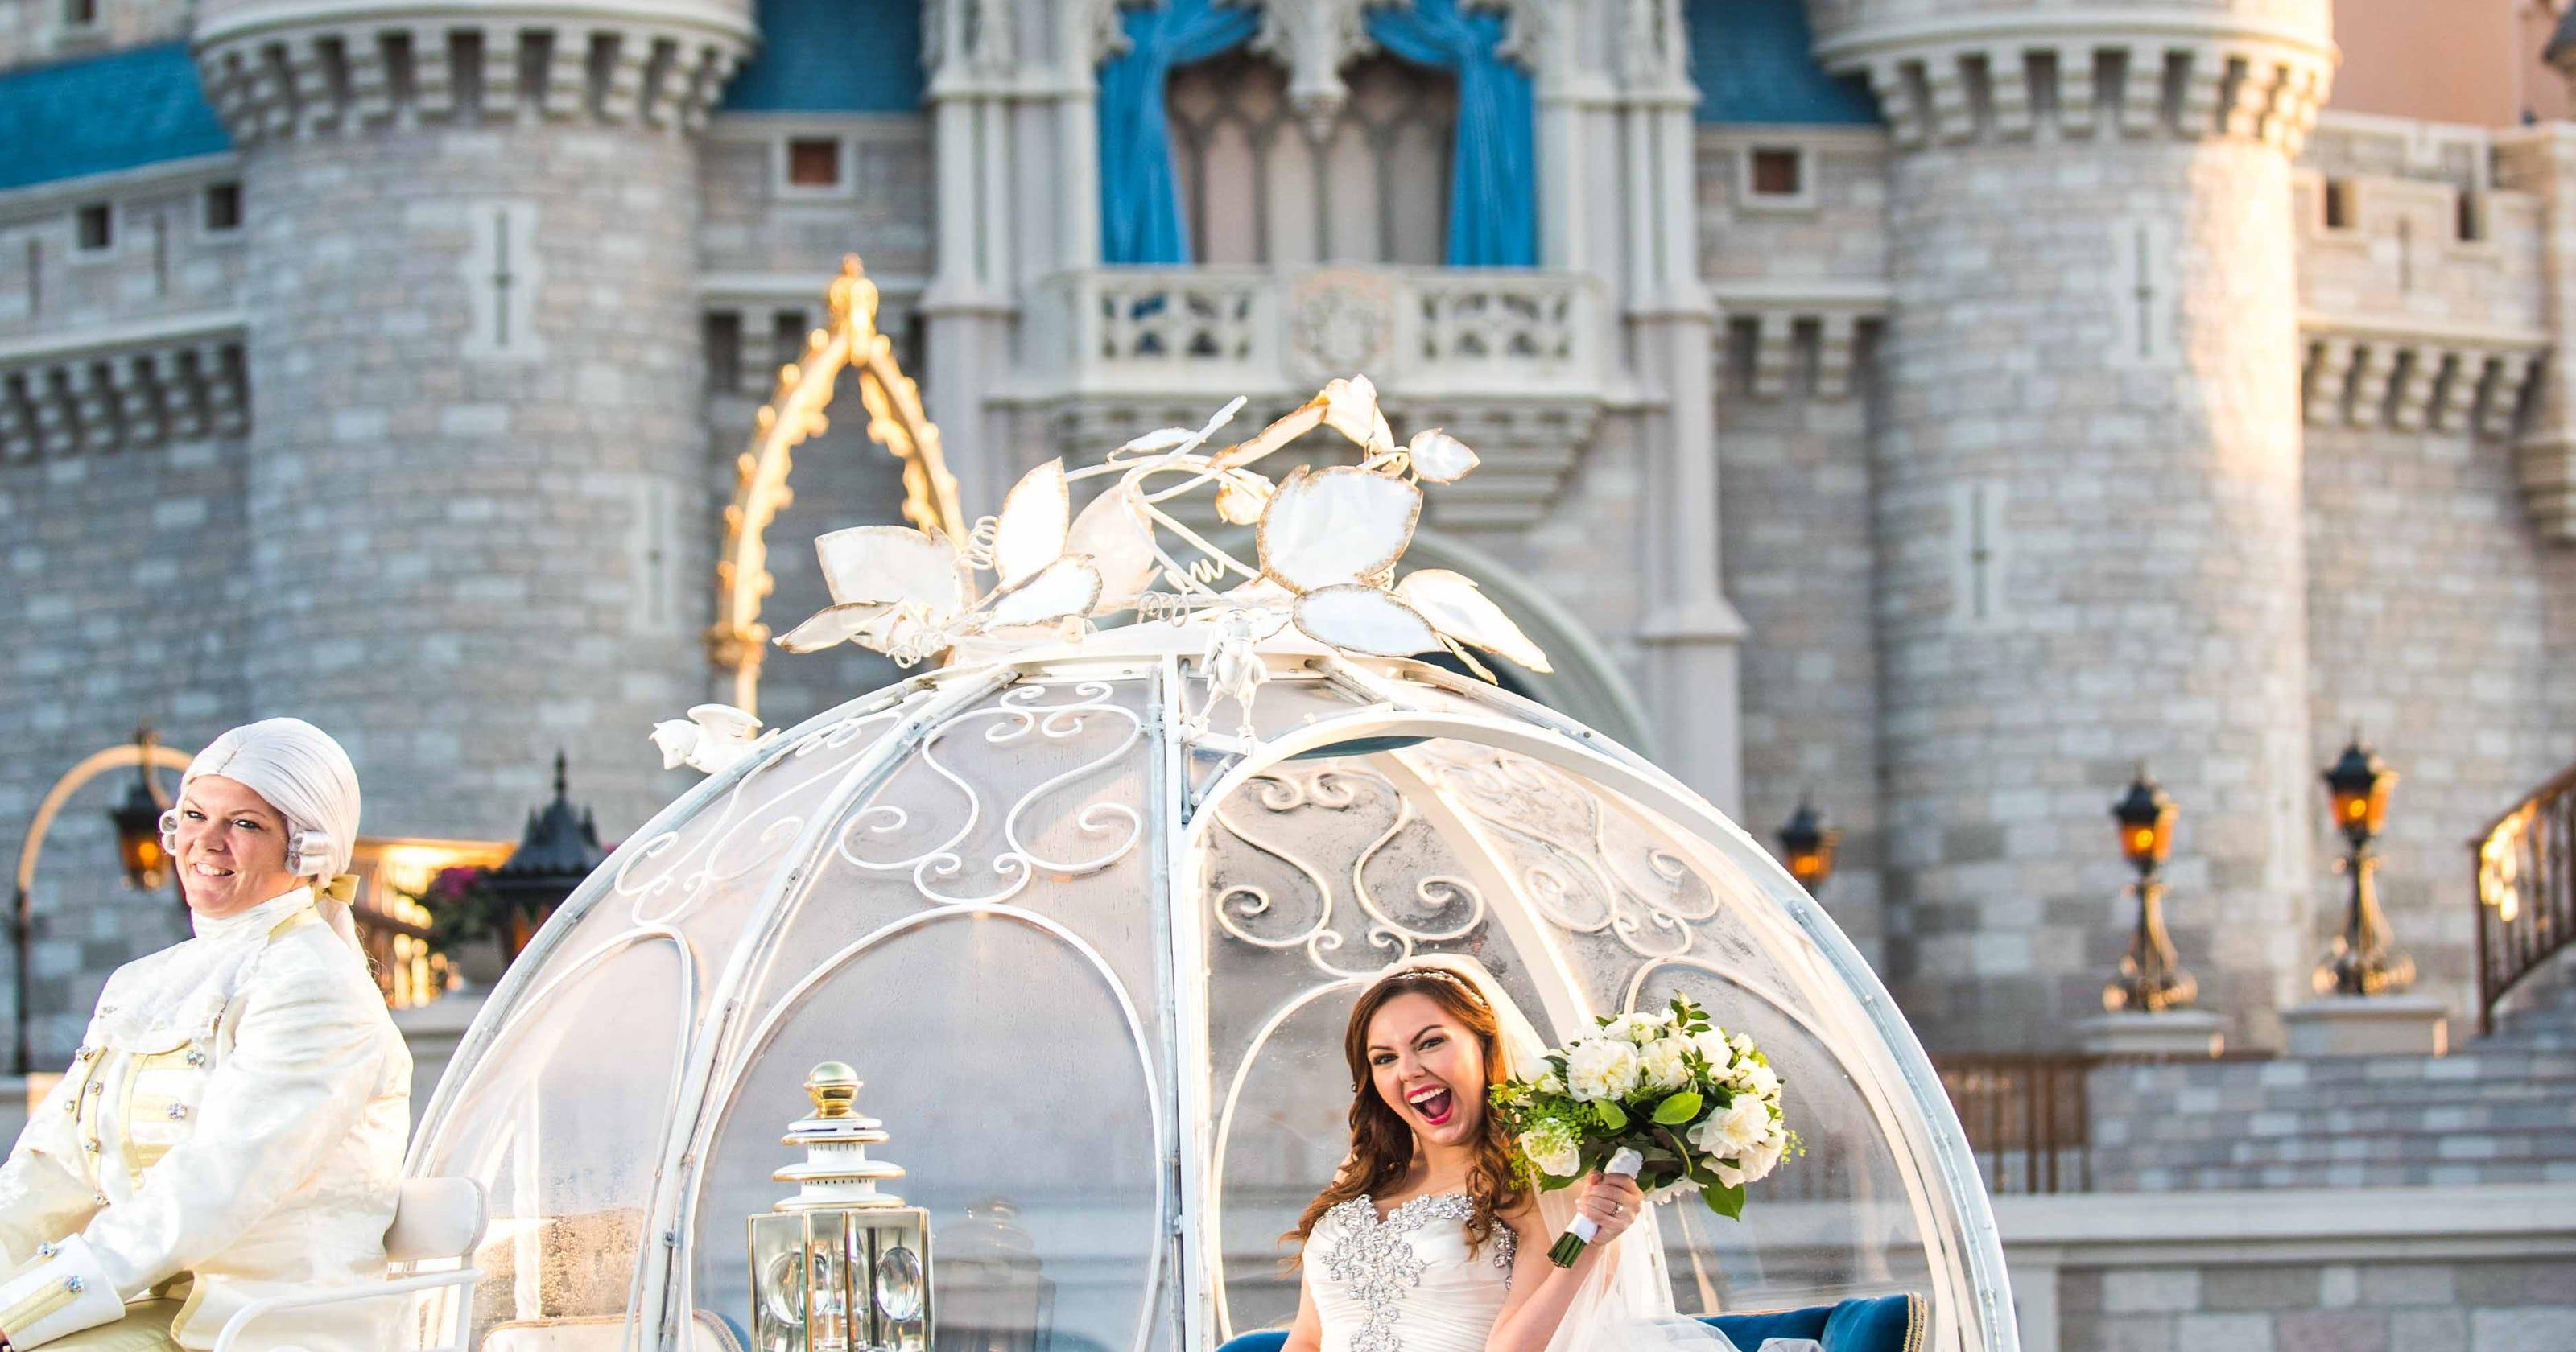 Disney Wedding Cost.Disneyland Wedding Venues Season Love